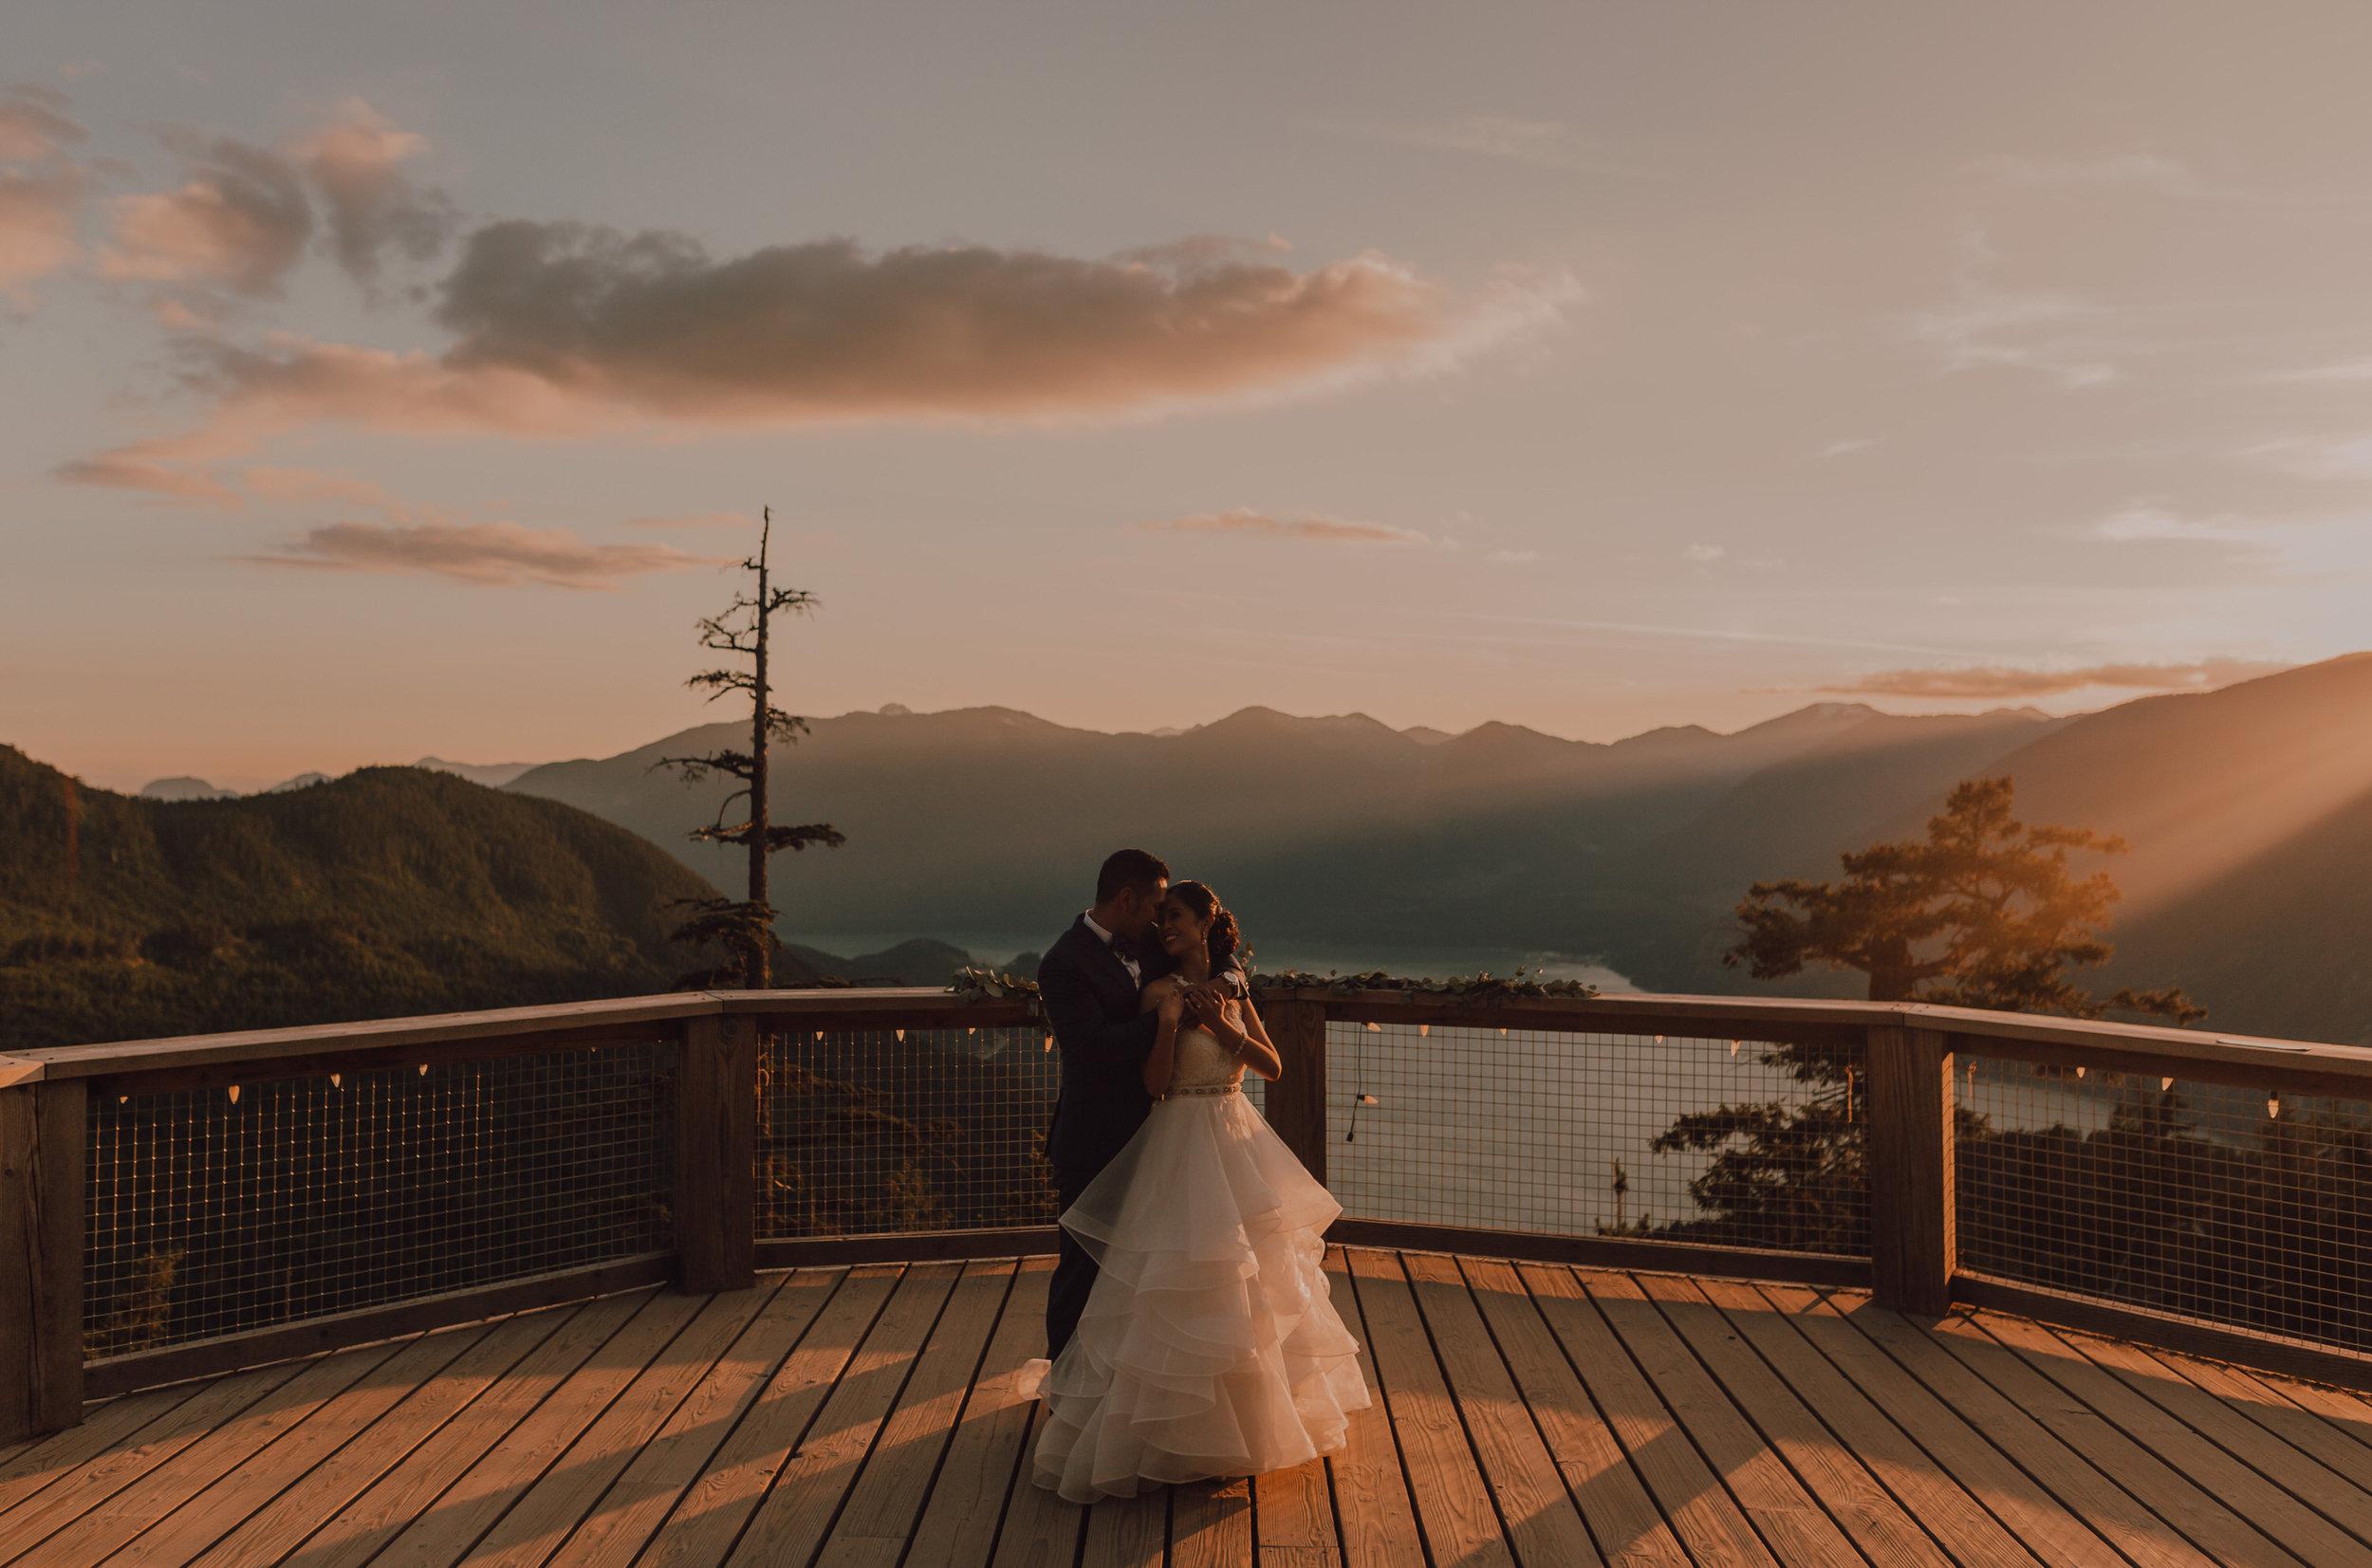 Squamish Wedding Photographer - Sea to Sky Gondola Wedding Photos -  Vancouver Wedding Photographer & Videographer - Sunshine Coast Wedding Photos - Sunshine Coast Wedding Photographer - Jennifer Picard Photography - IMG_5131.jpg